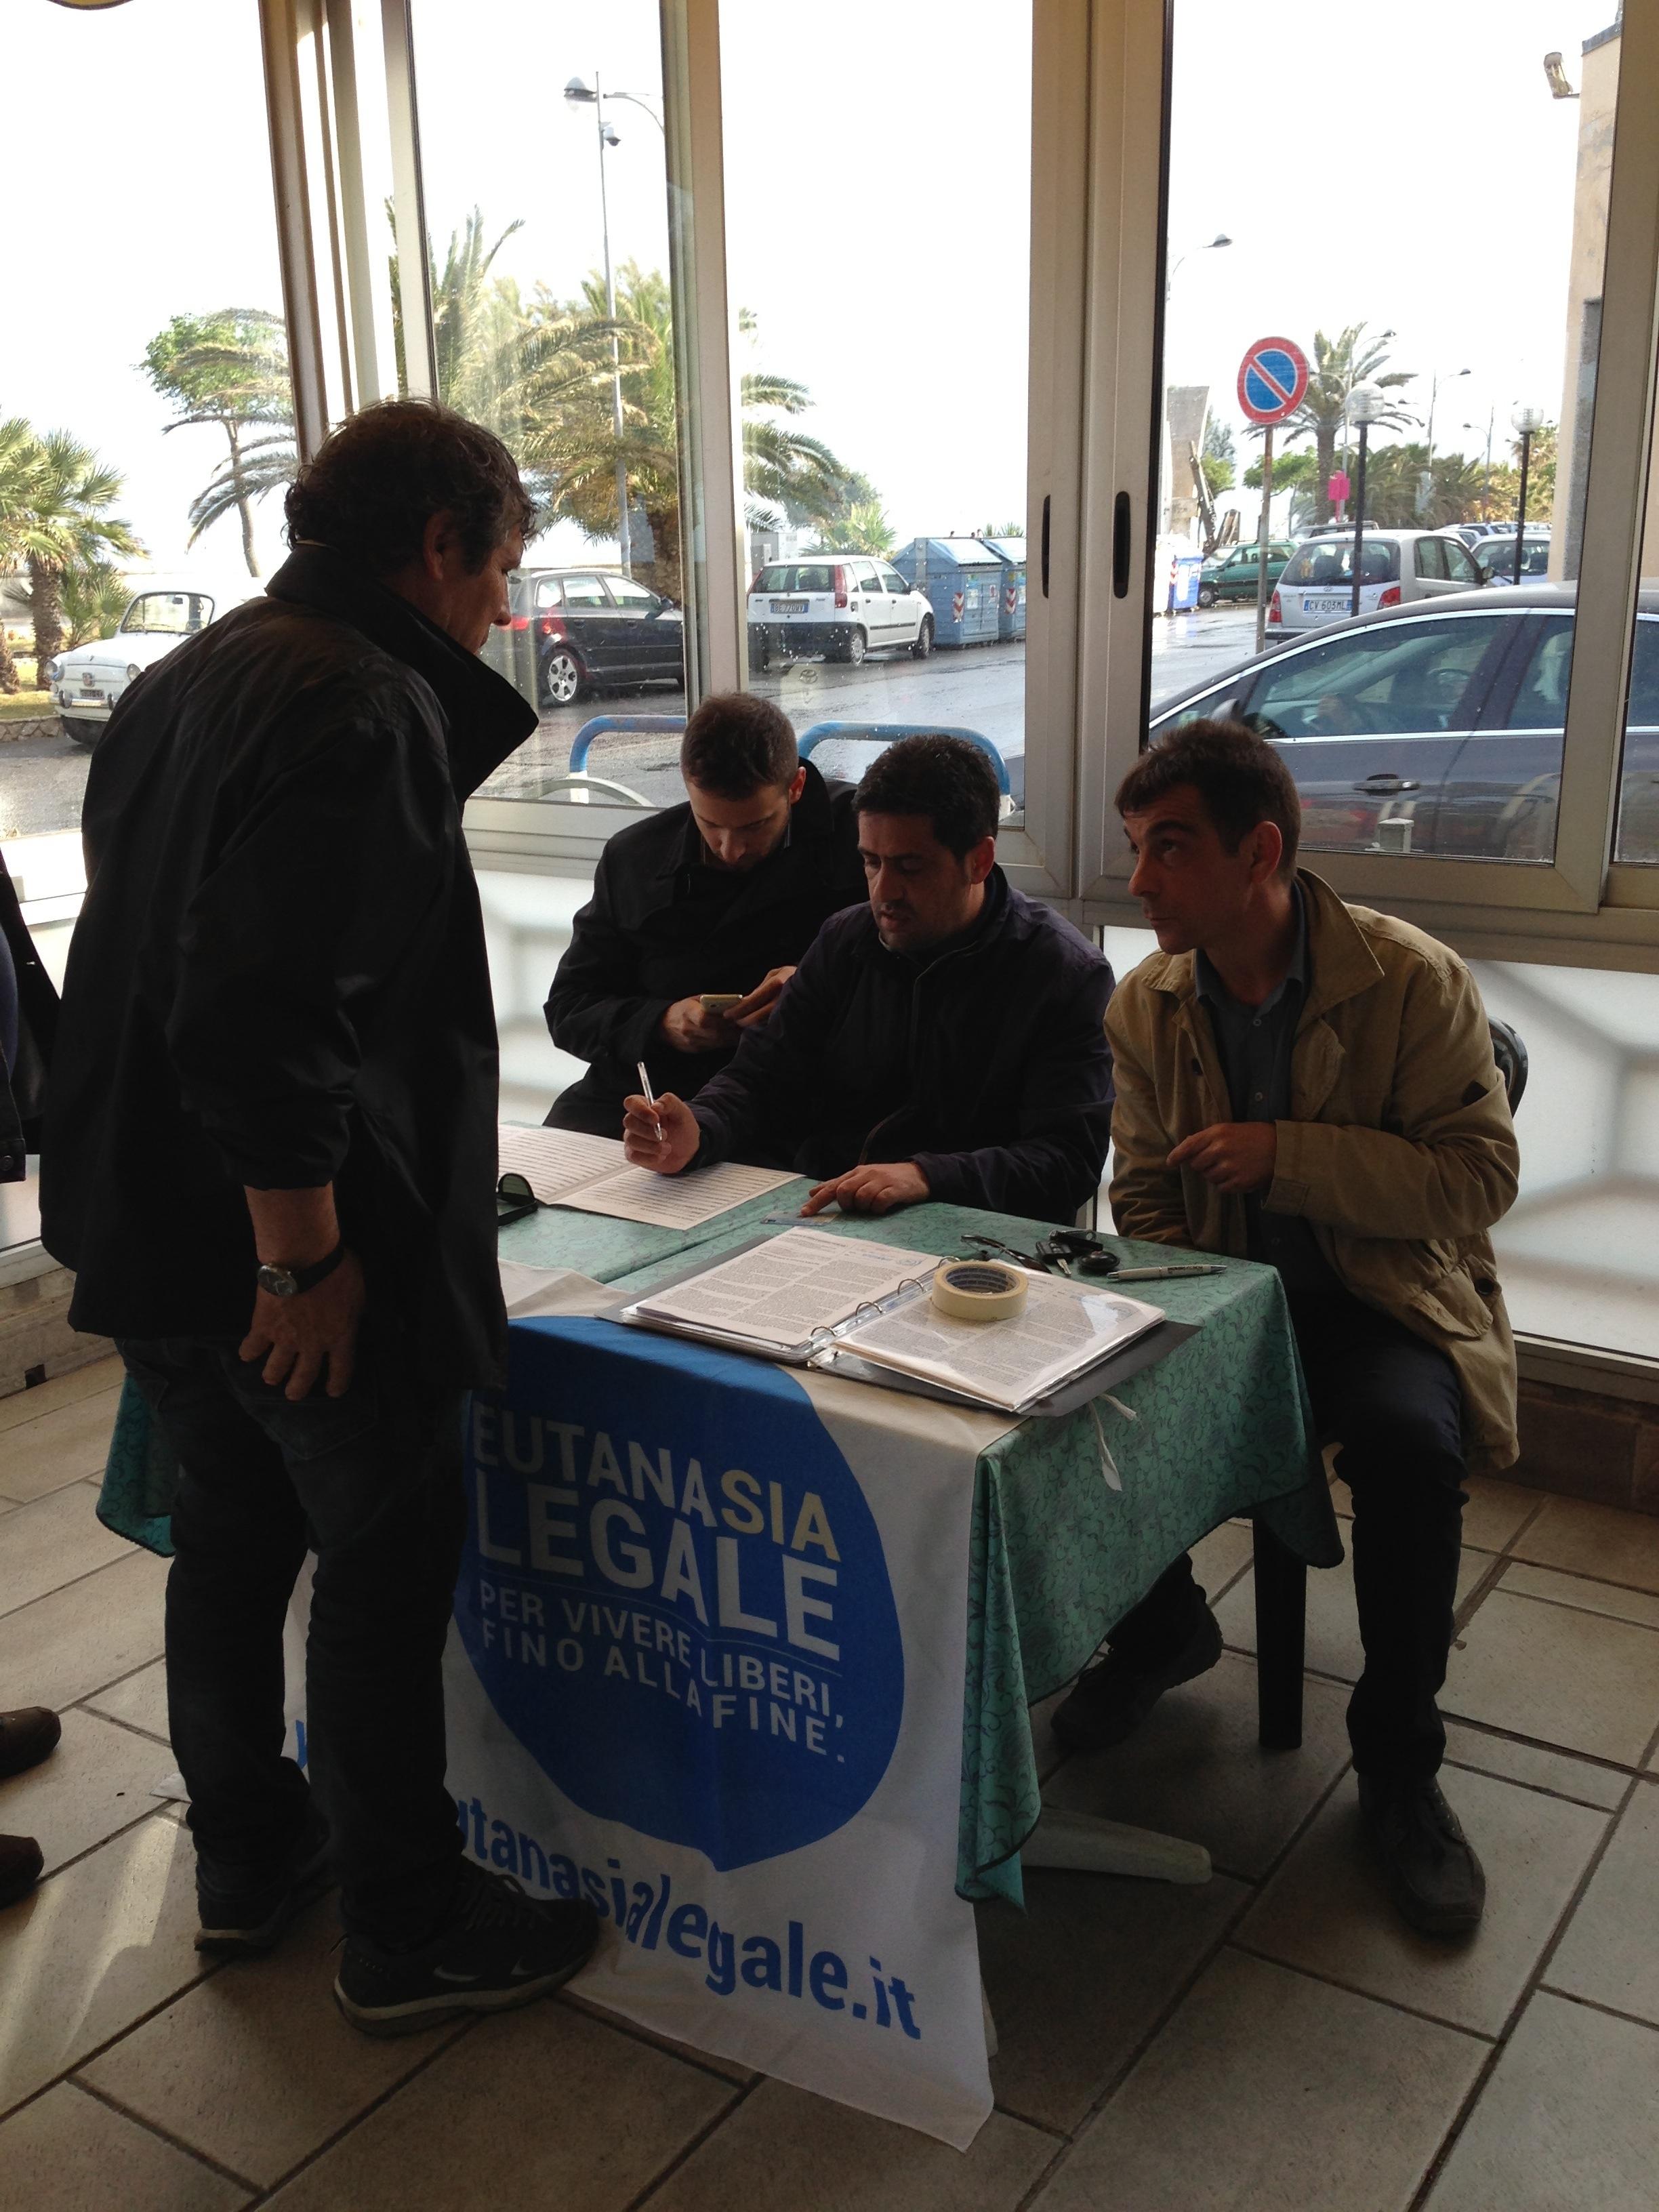 Eutanasia legale: raccolta a Catanzaro con Sel e Socialisti ecologisti